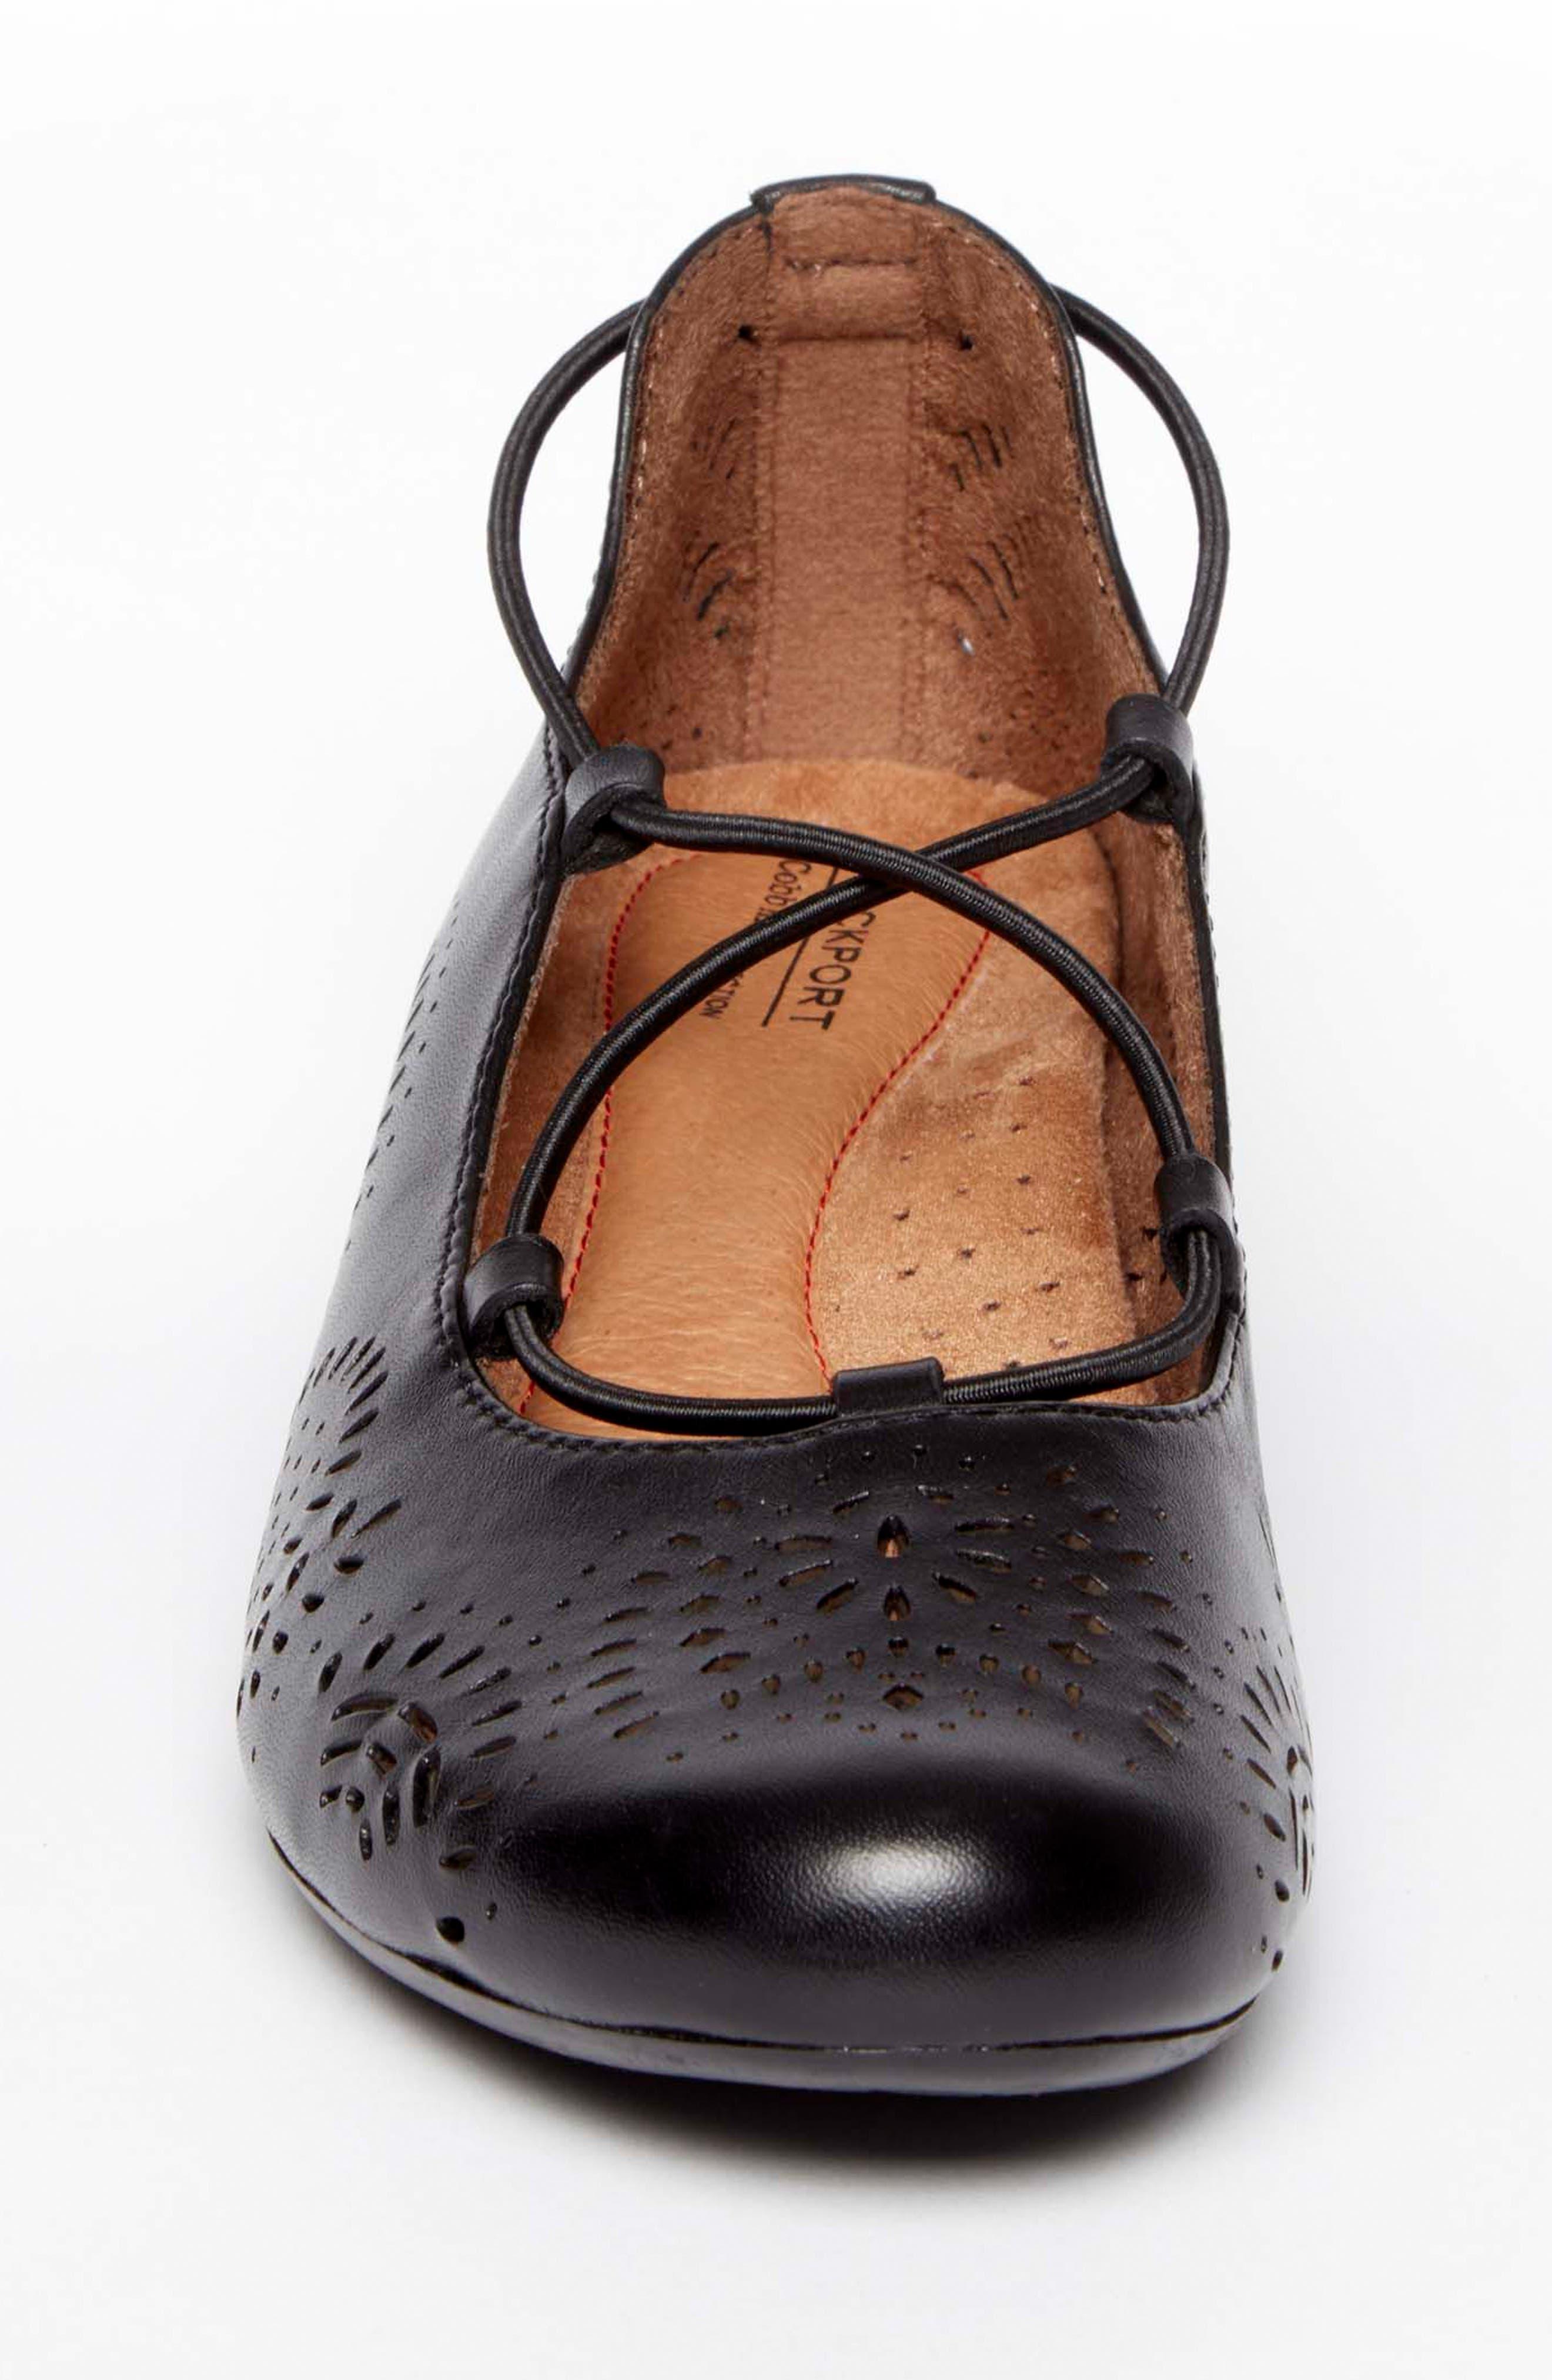 Janna Cross Strap Wedge Sandal,                             Alternate thumbnail 17, color,